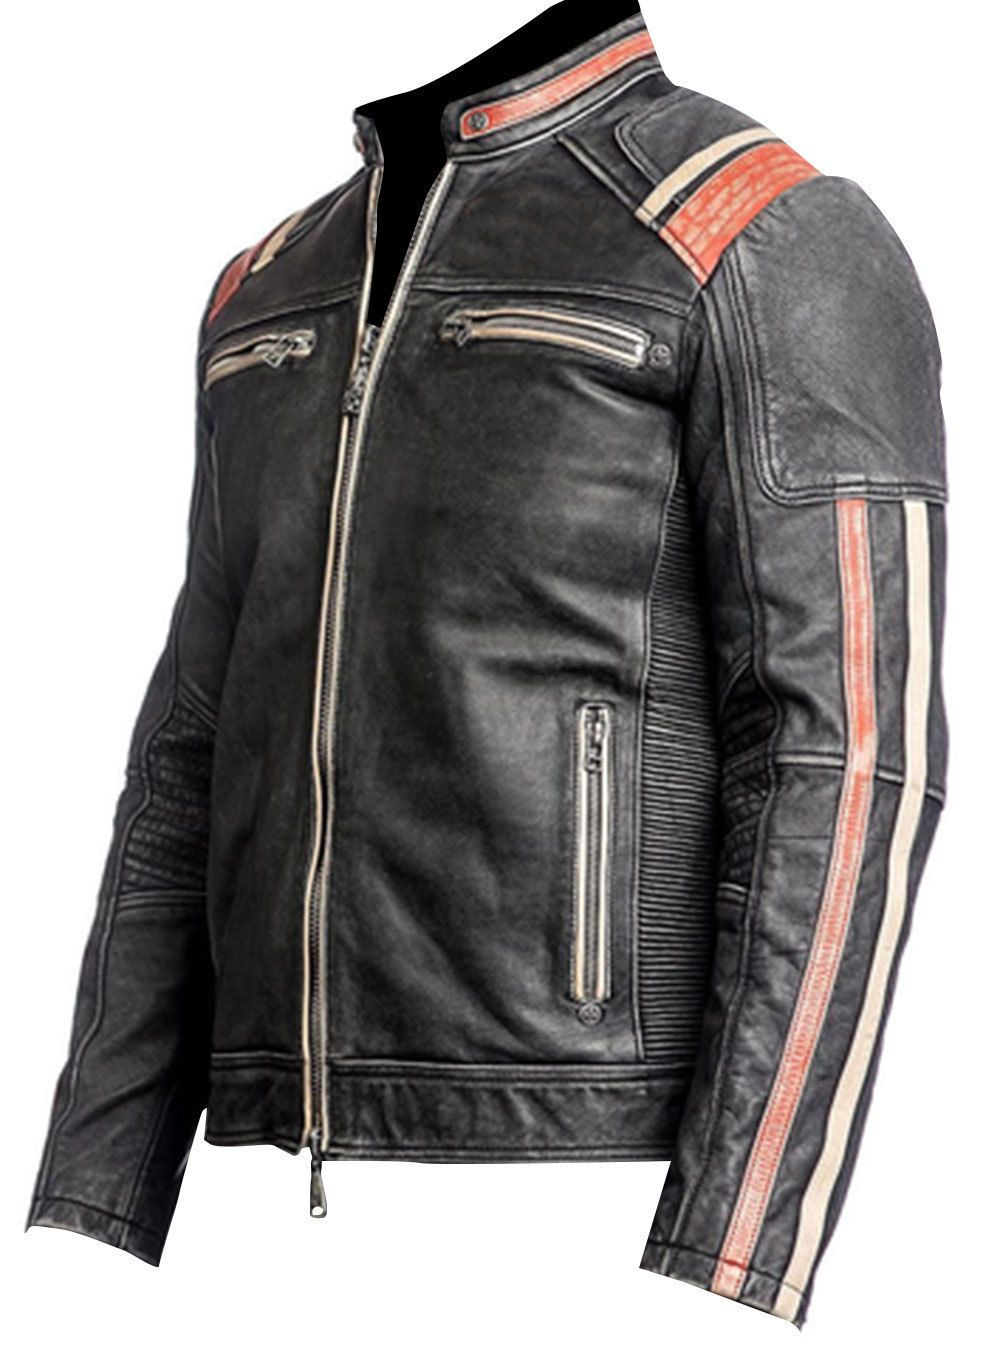 7b3b89c66e1 Para hombres De colección Moto Cafe Racer Motociclista Retro Negro Chaqueta  De Cuero Envejecido